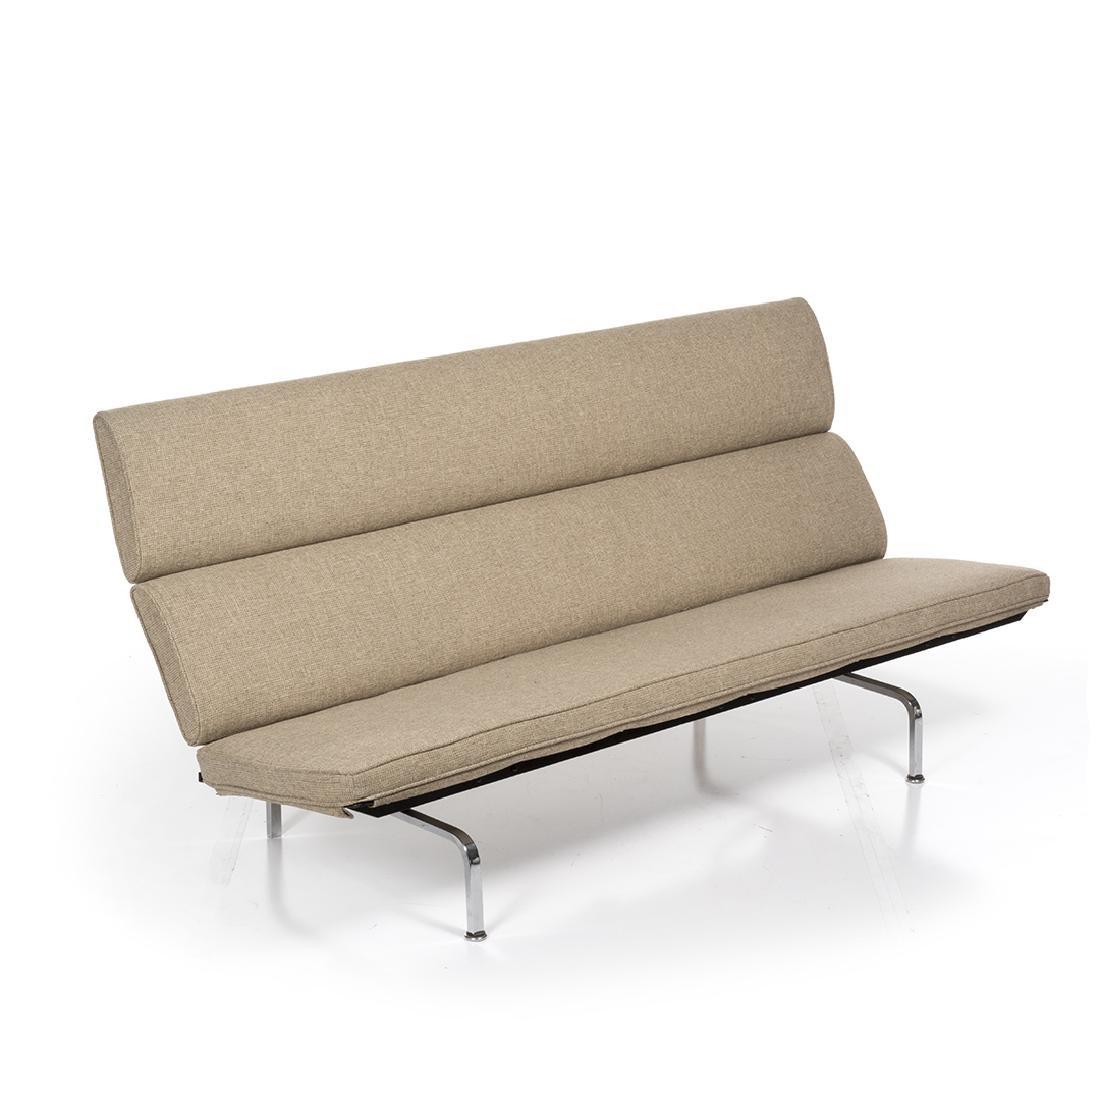 Eames Compact Sofa - 2